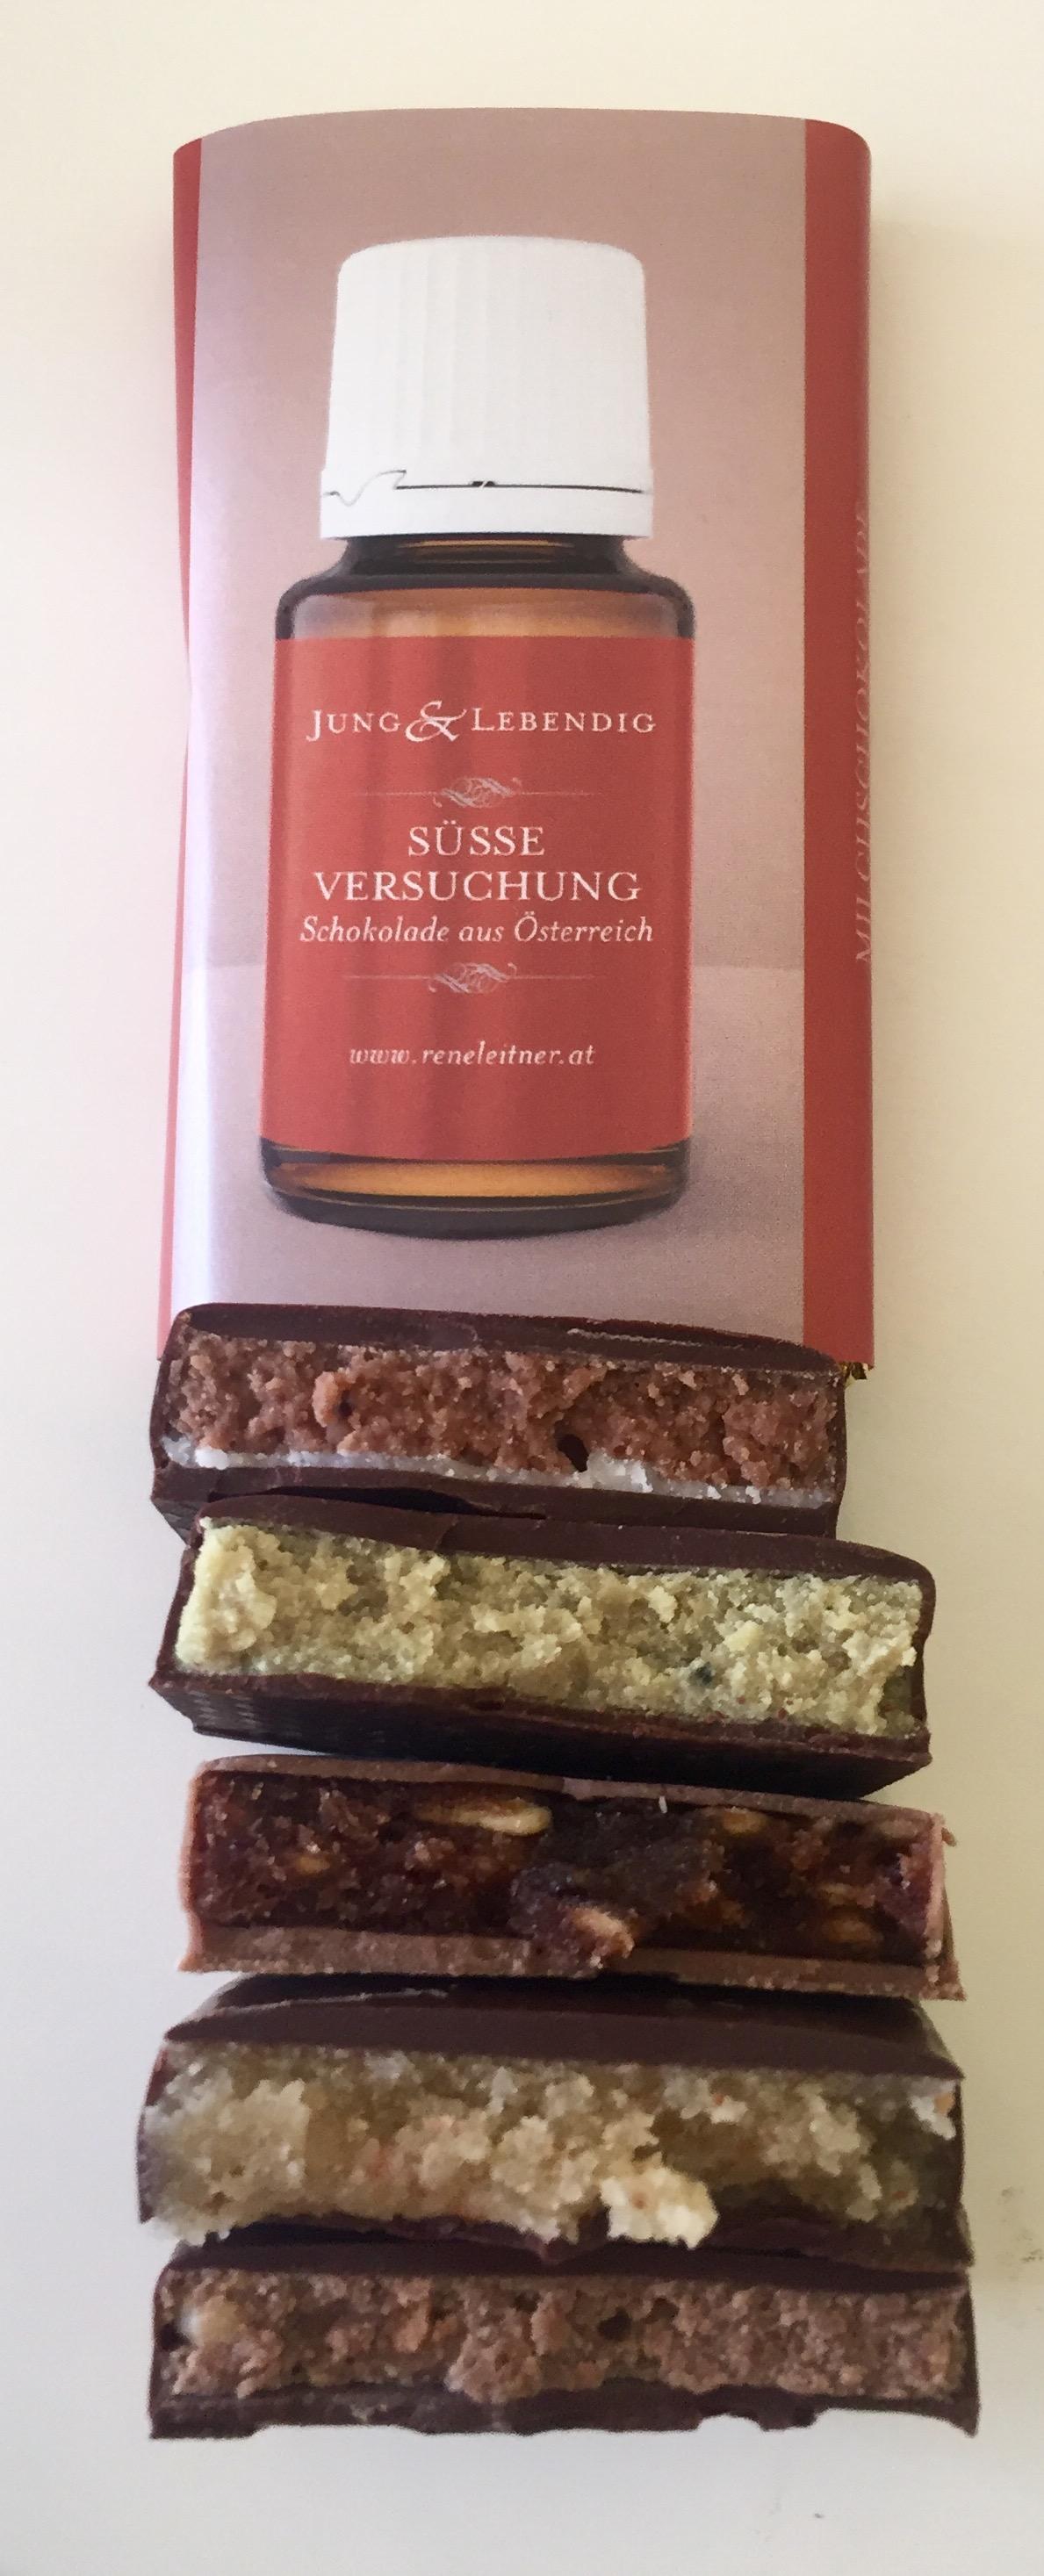 Ätherisches Öl Young Living: Öle Schokoladen mit YL Plus Ölen gefüllt